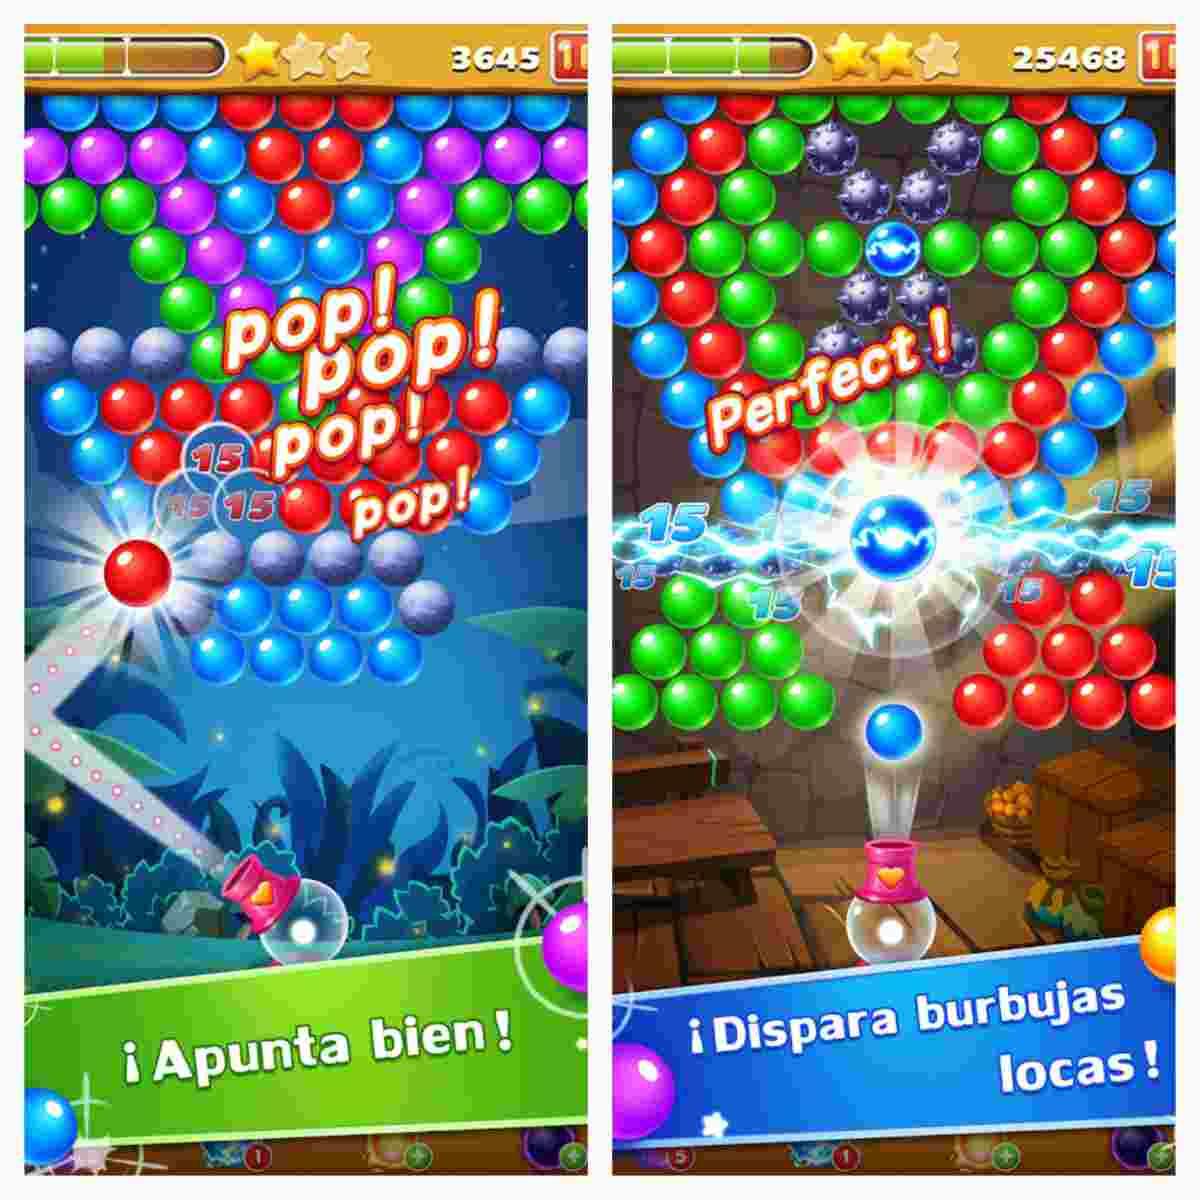 Burbujas locas para Android